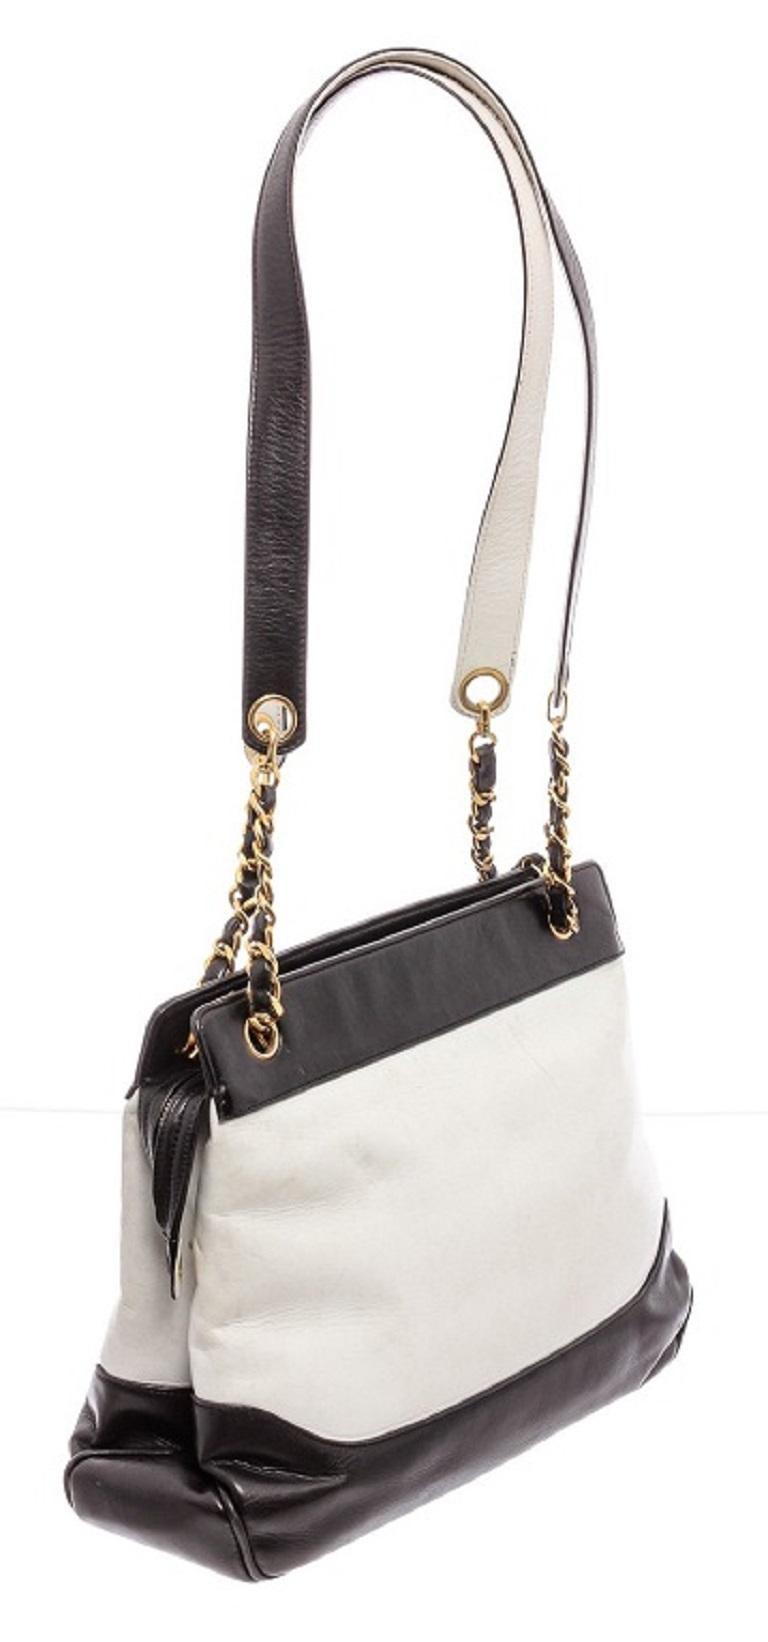 Chanel Black White Two-Tone Leather Vintage Timeless CC Charm Shoulder Bag For Sale 2